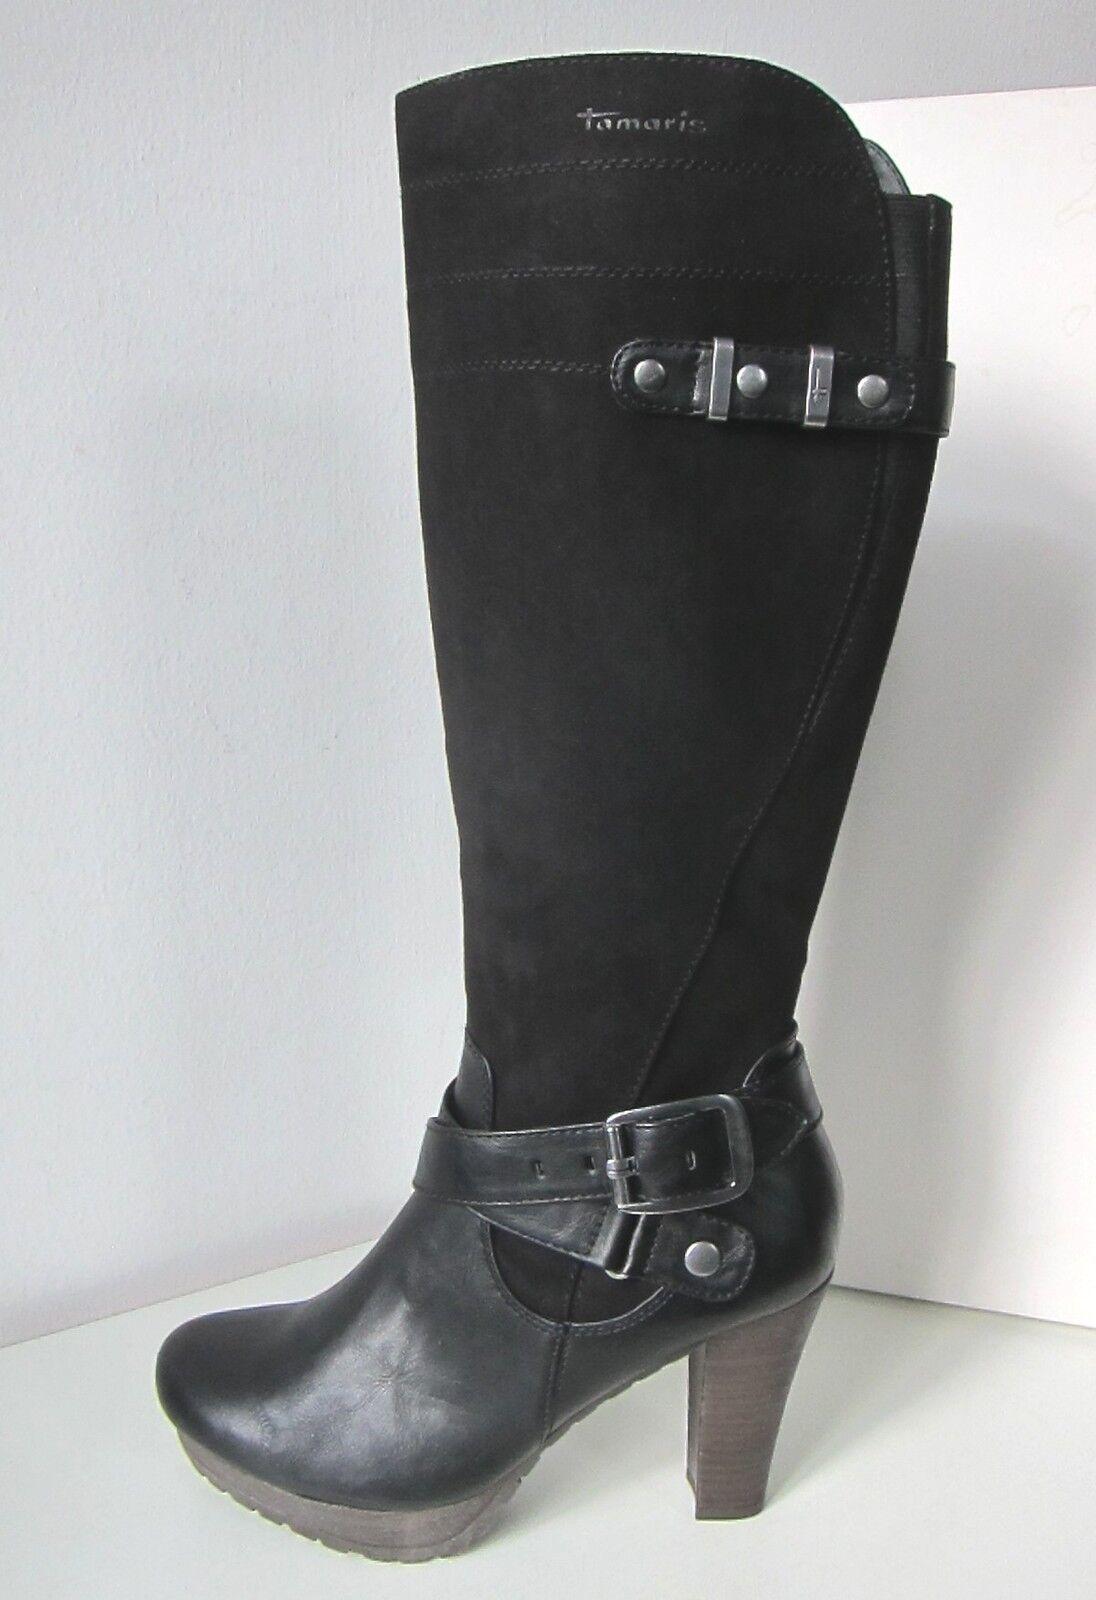 Tamaris Stiefel High Heel schwarz Gr. 41 Stiefel Immitat schwarz Material Mix Leder Immitat Stiefel ff9d66